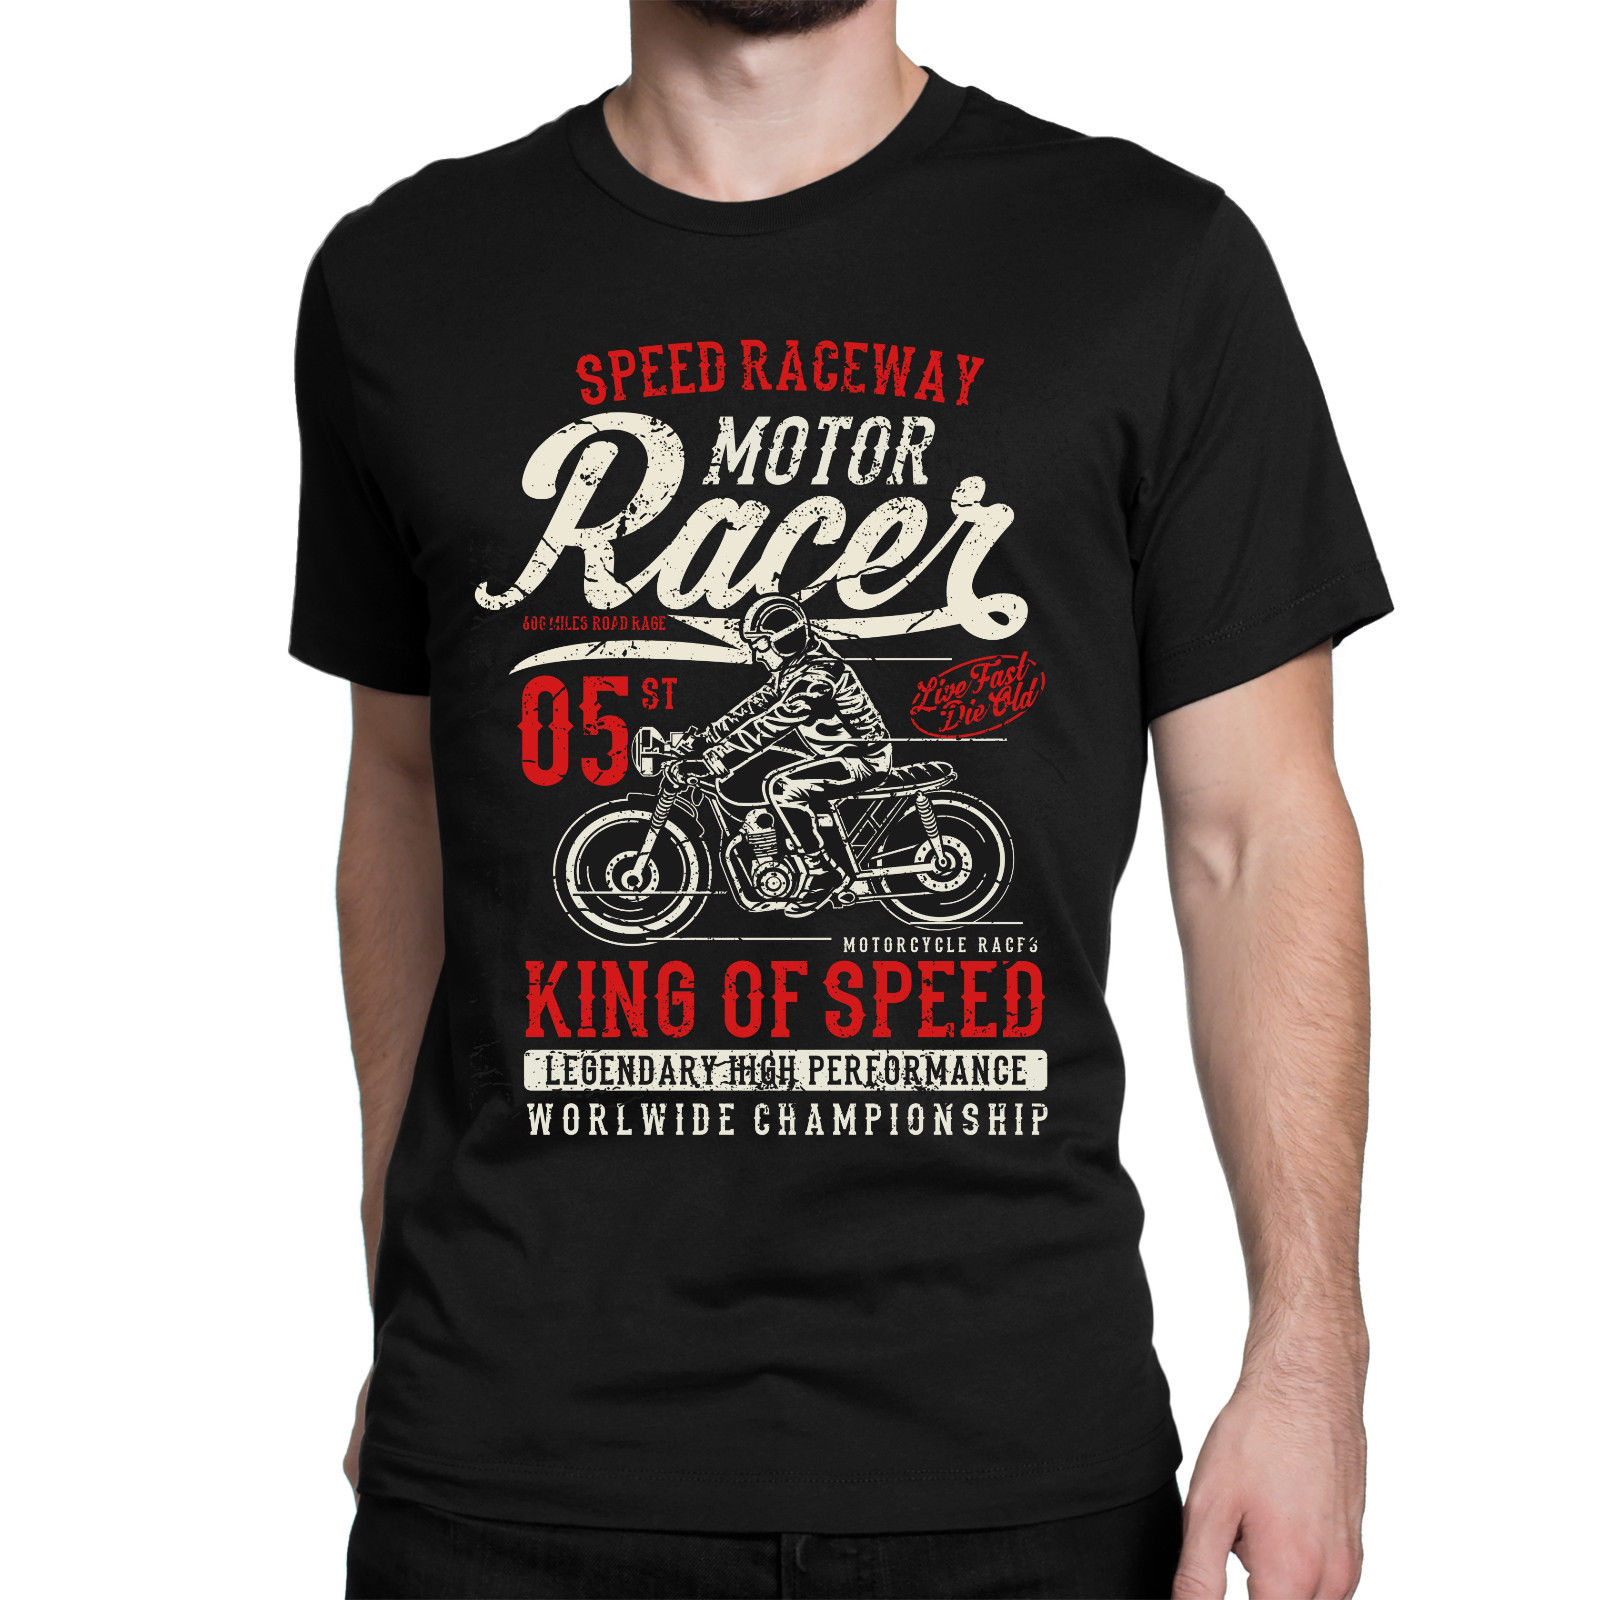 футболка Moto Biker Moto R Racer Racing Vintage Bsa Triumph